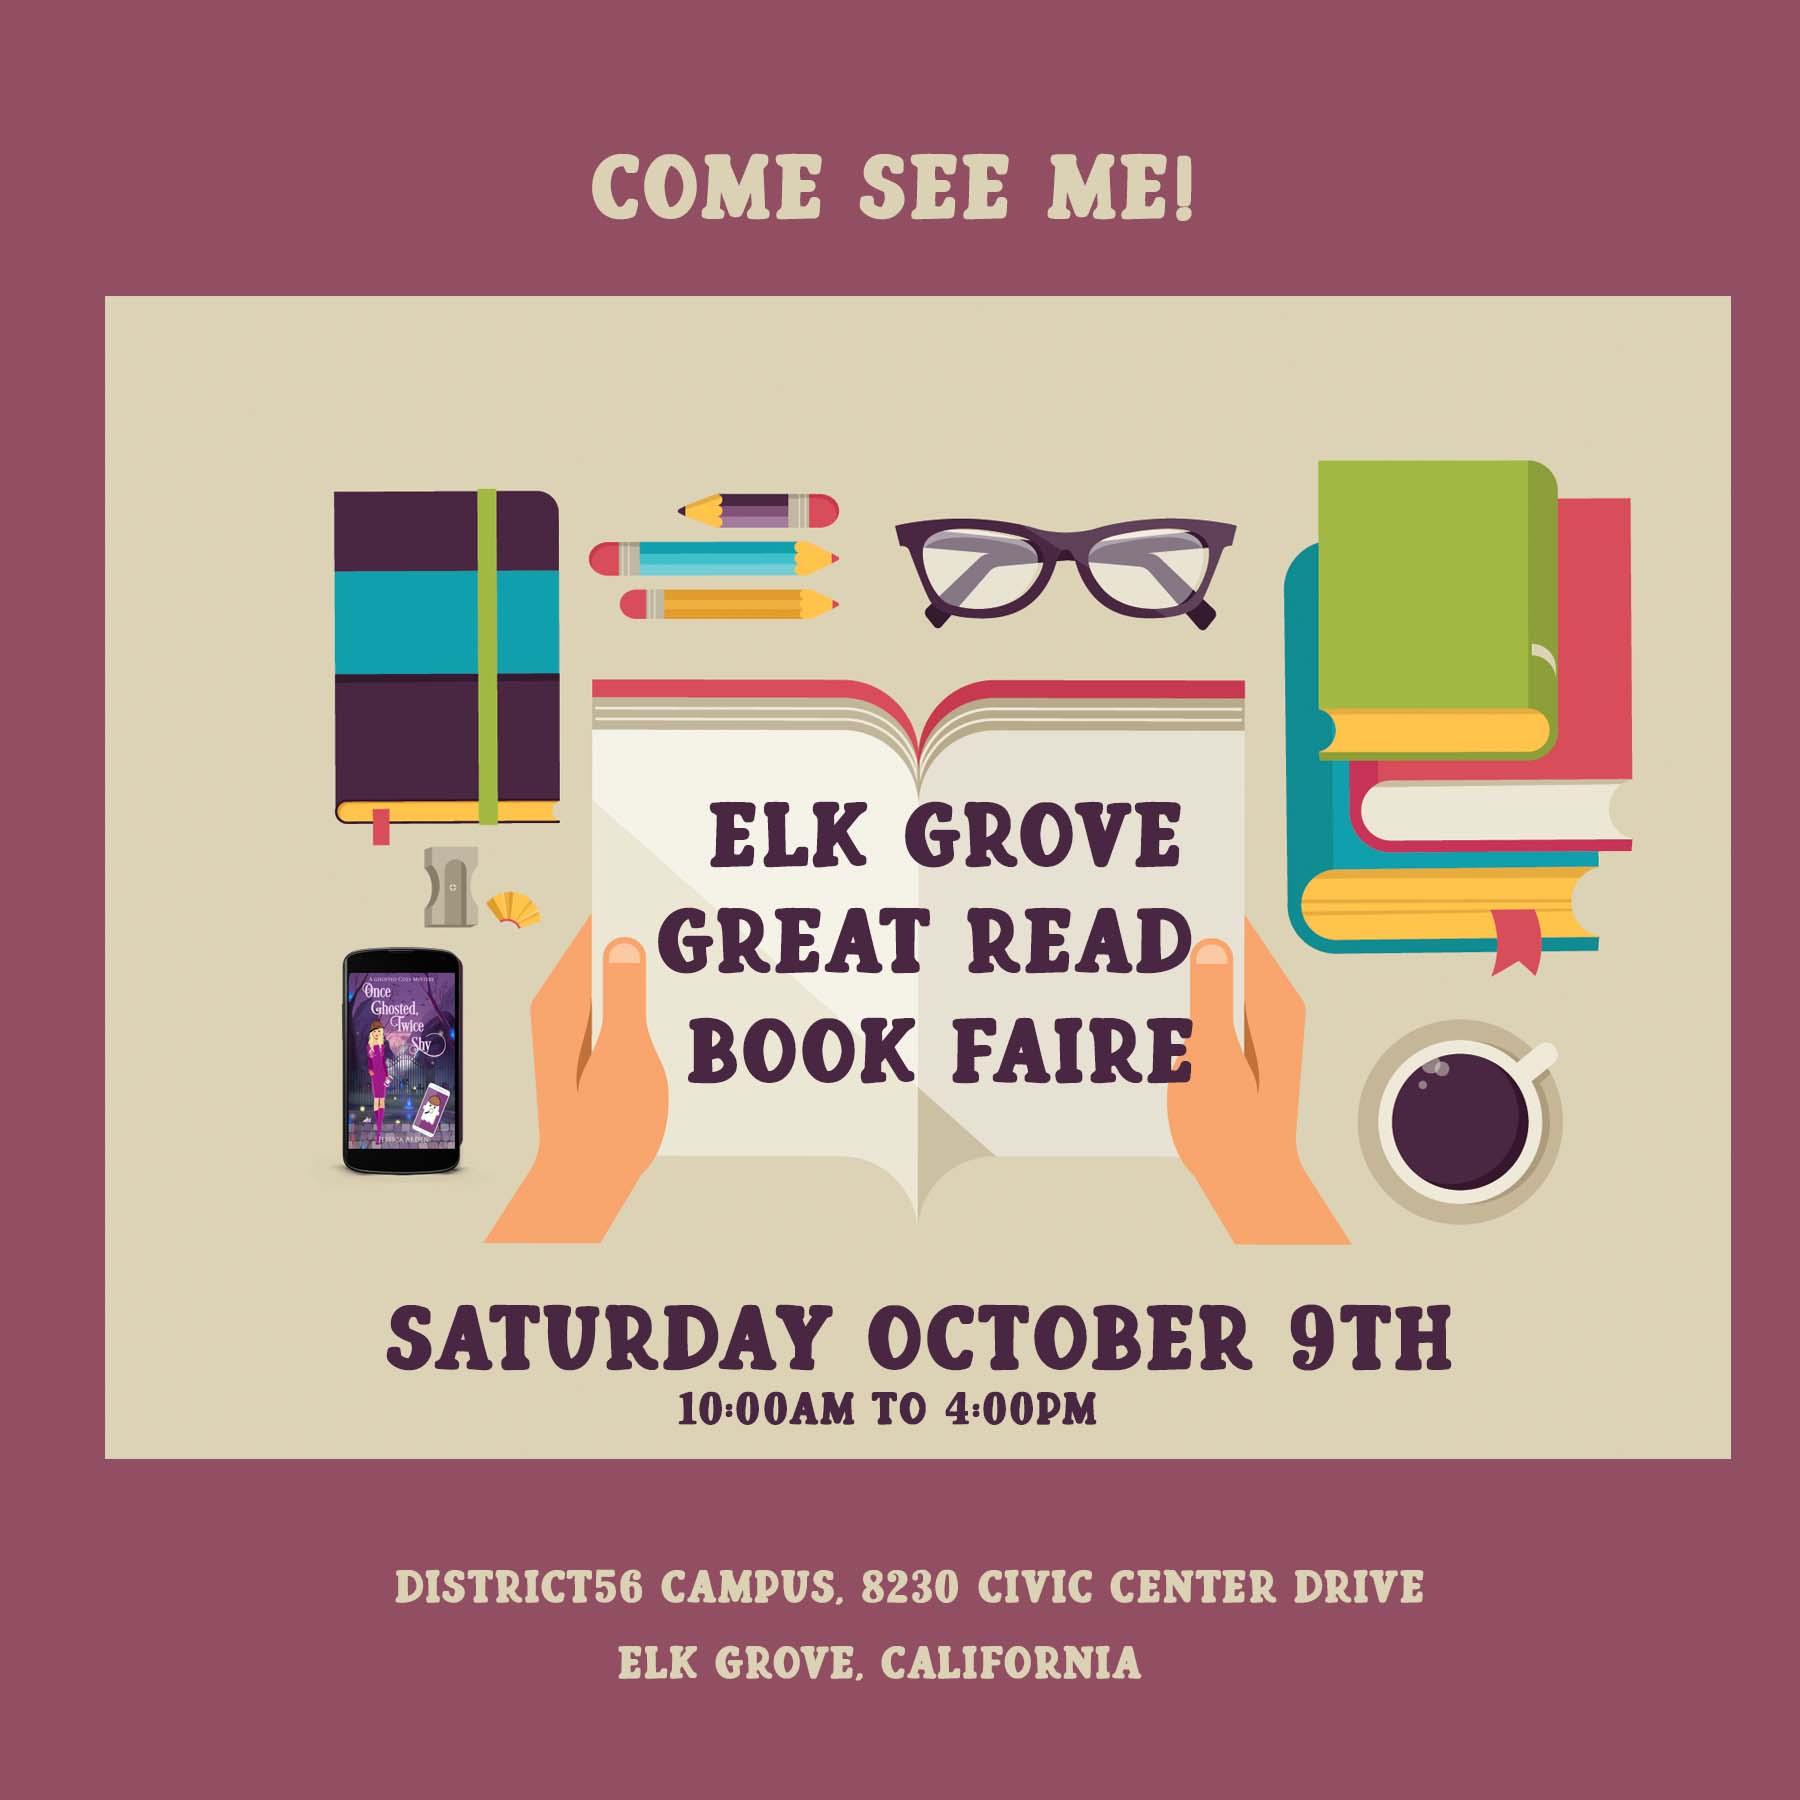 Elk Grove Great Read Book Faire